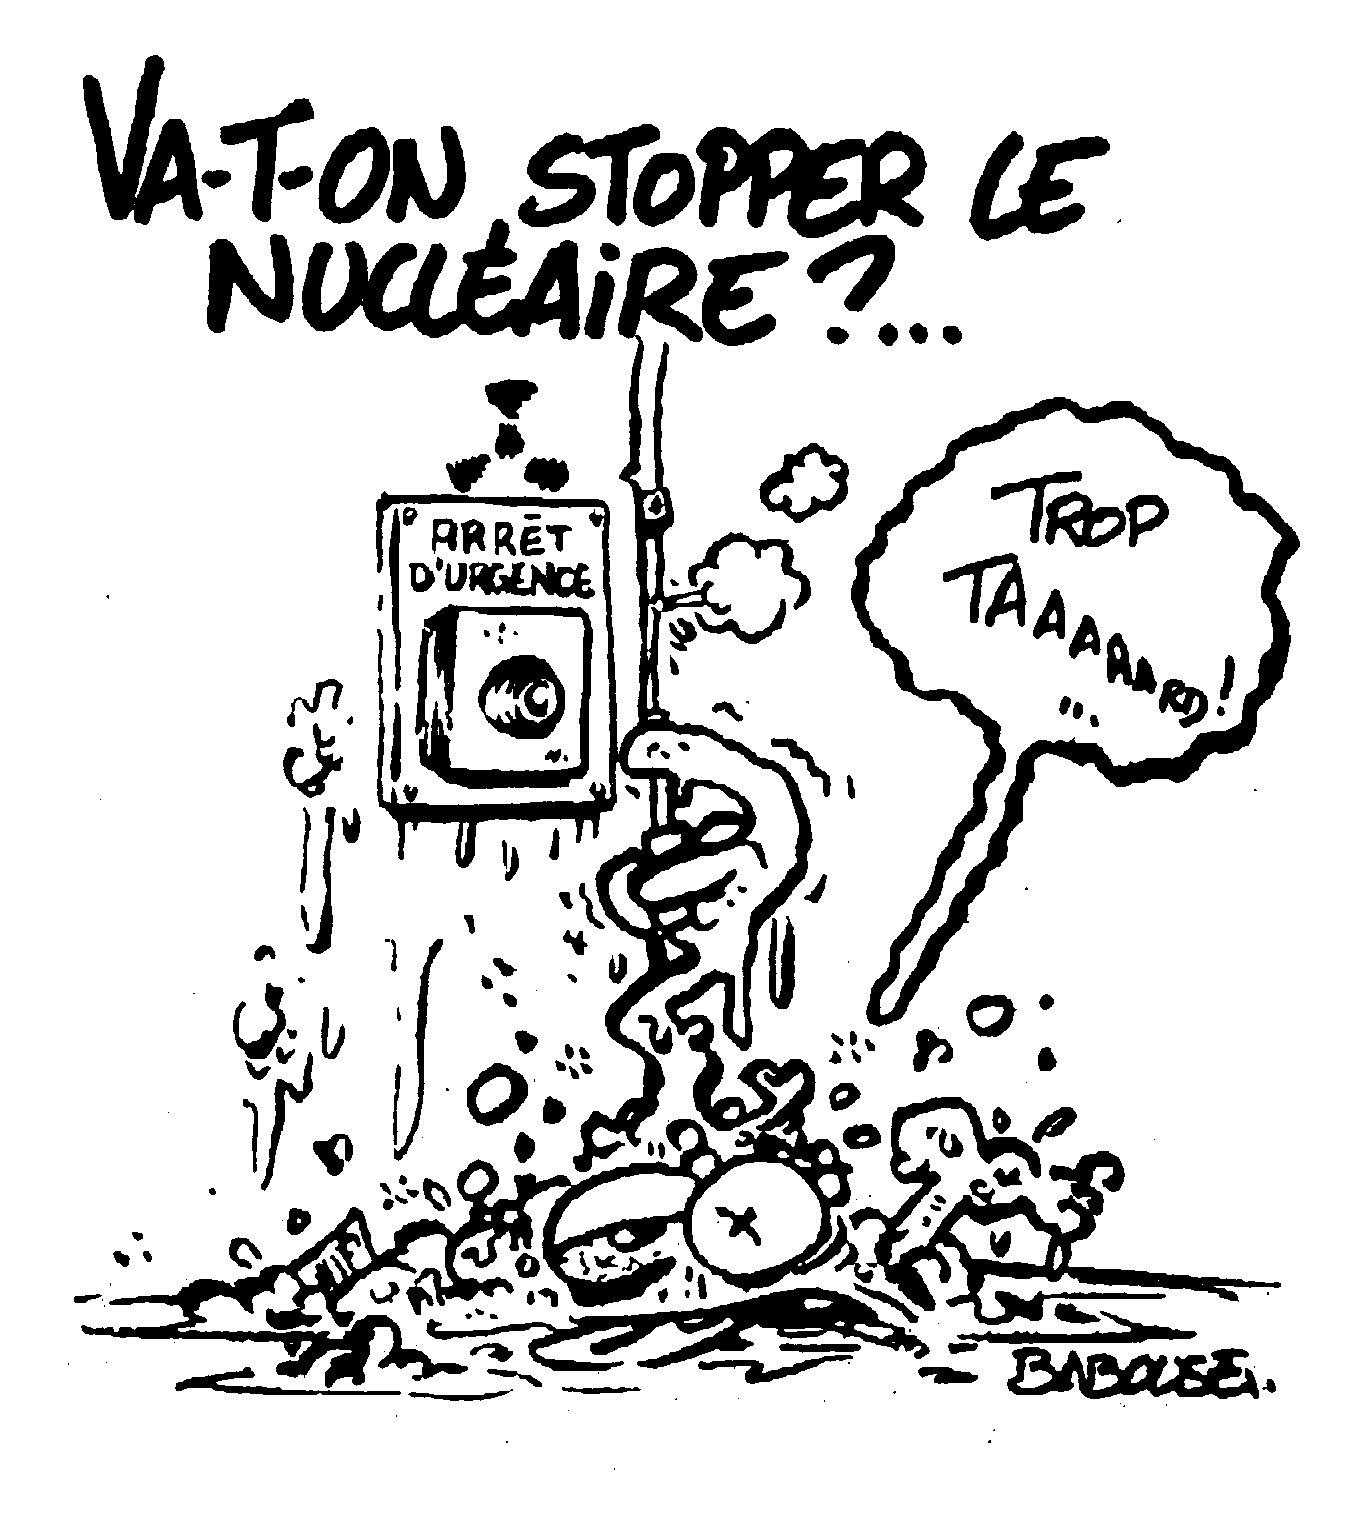 http://1.bp.blogspot.com/-I2oWFXli1-g/TfGbL_veGsI/AAAAAAAAClM/lLALfDttoVs/s1600/nucleaire3.jpg